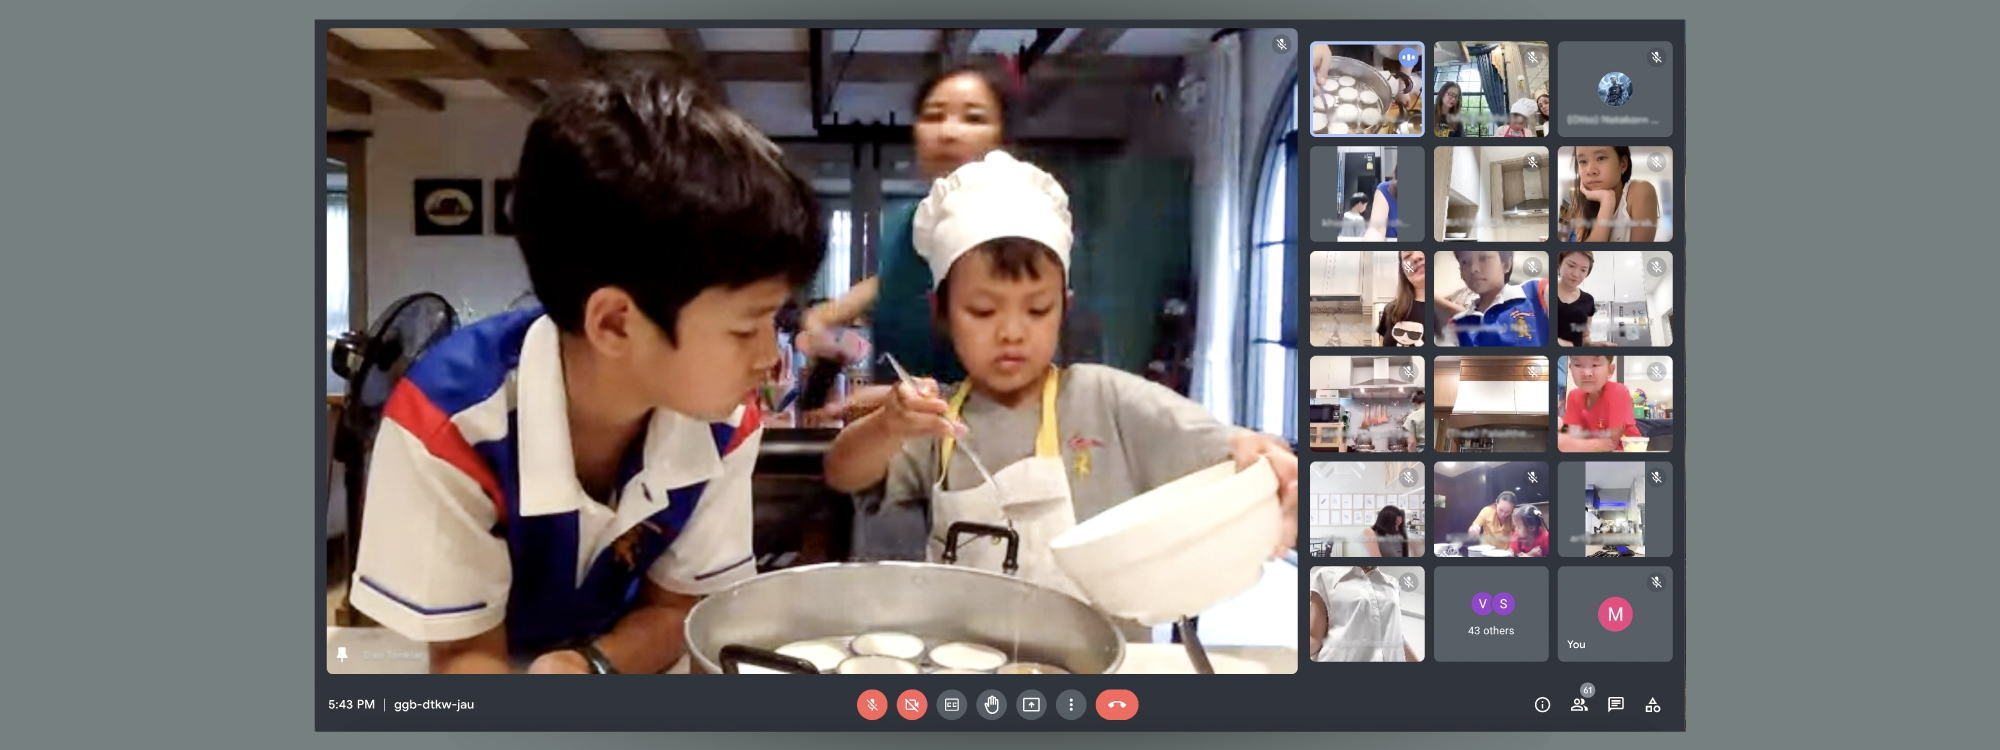 Homemade Ka-nom-thuay by families of King's Bangkok